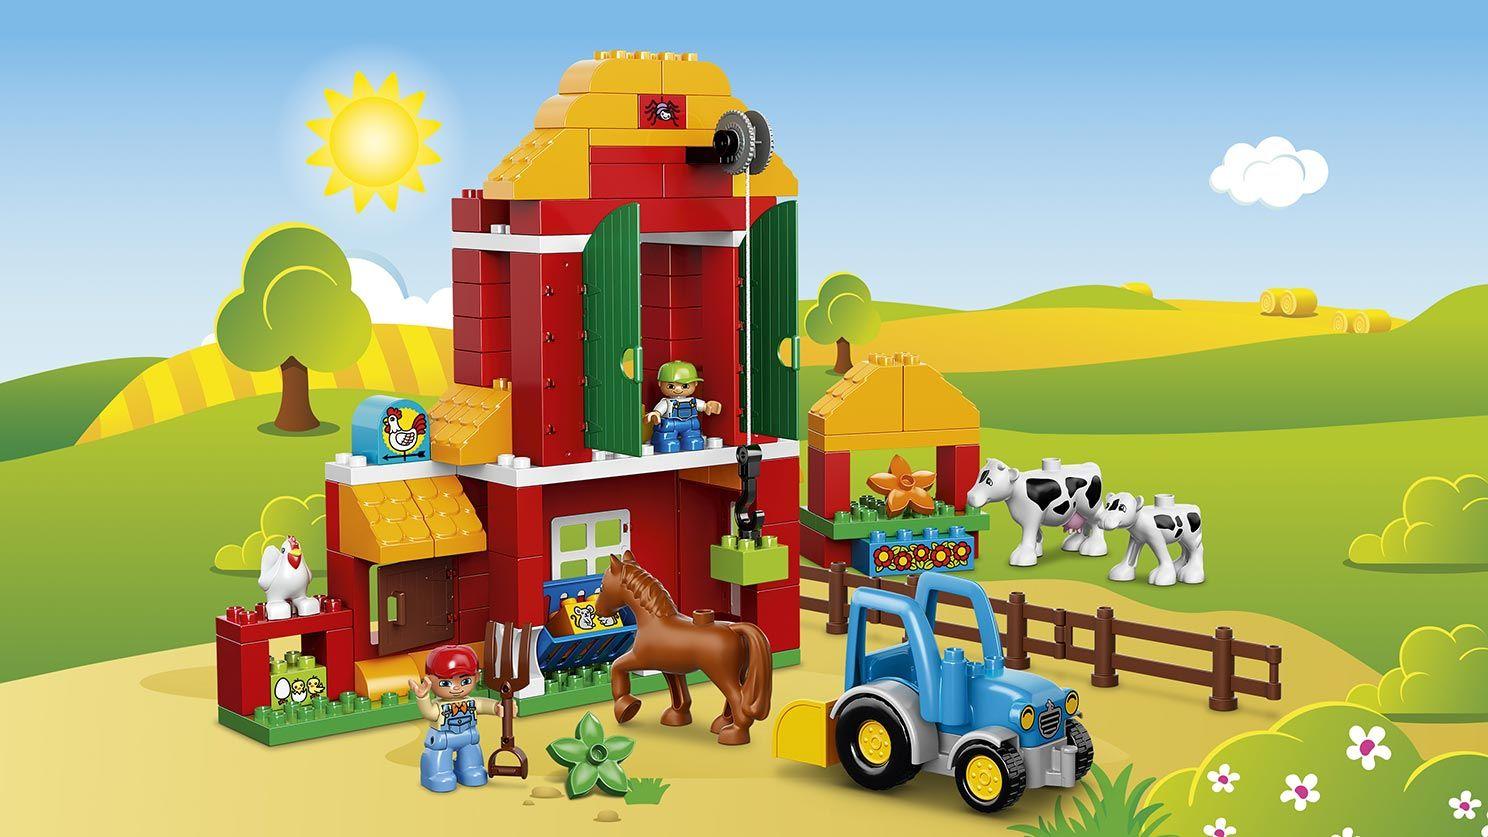 Own Duplo City, Big Farm, April 2016